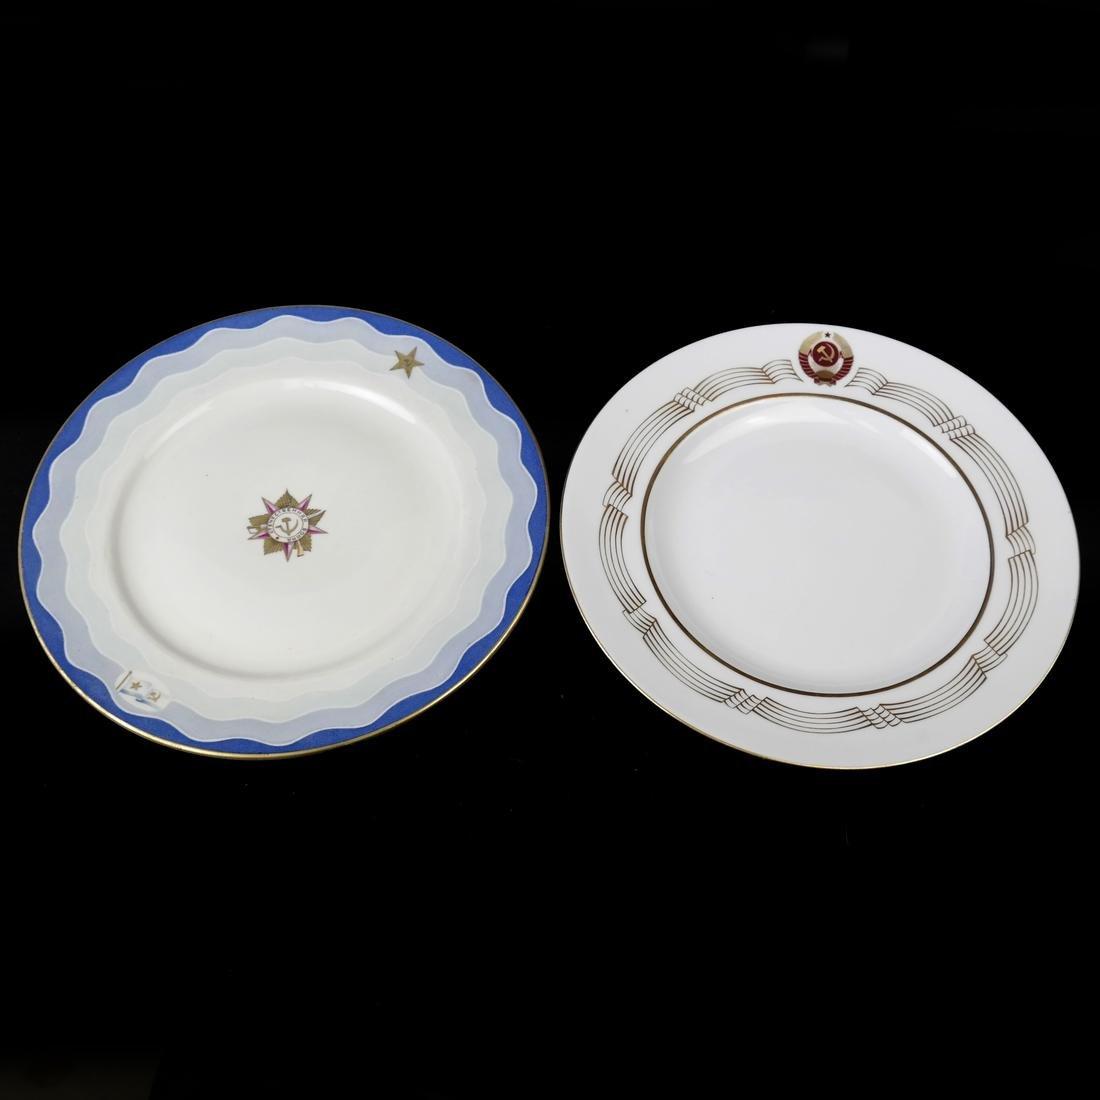 8 Russian Plates - 2